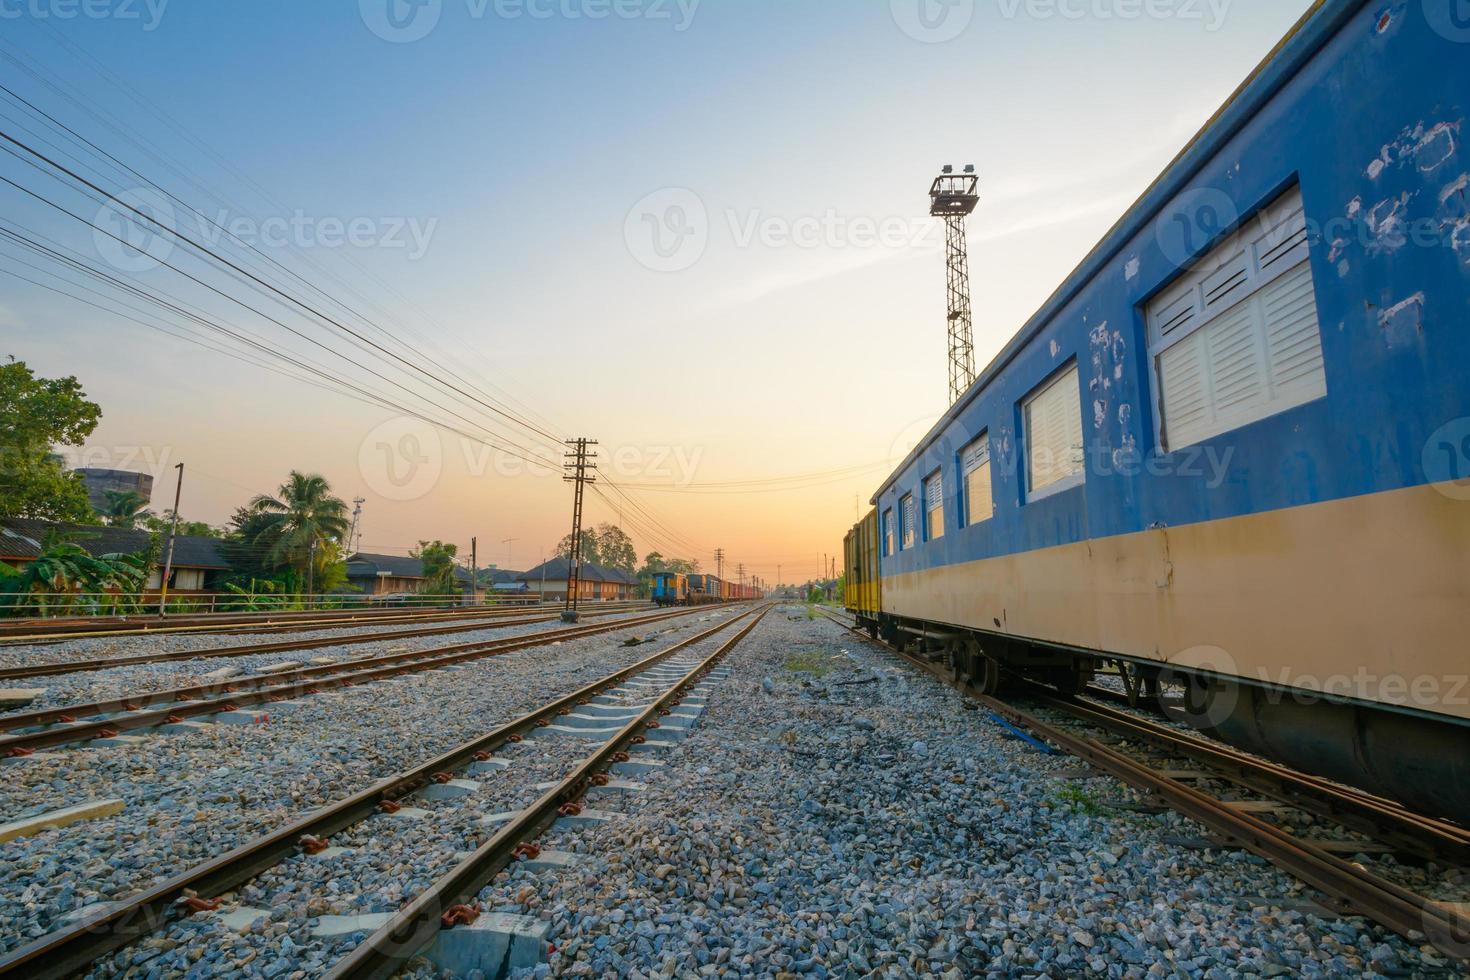 Bahngleise und Waggon foto